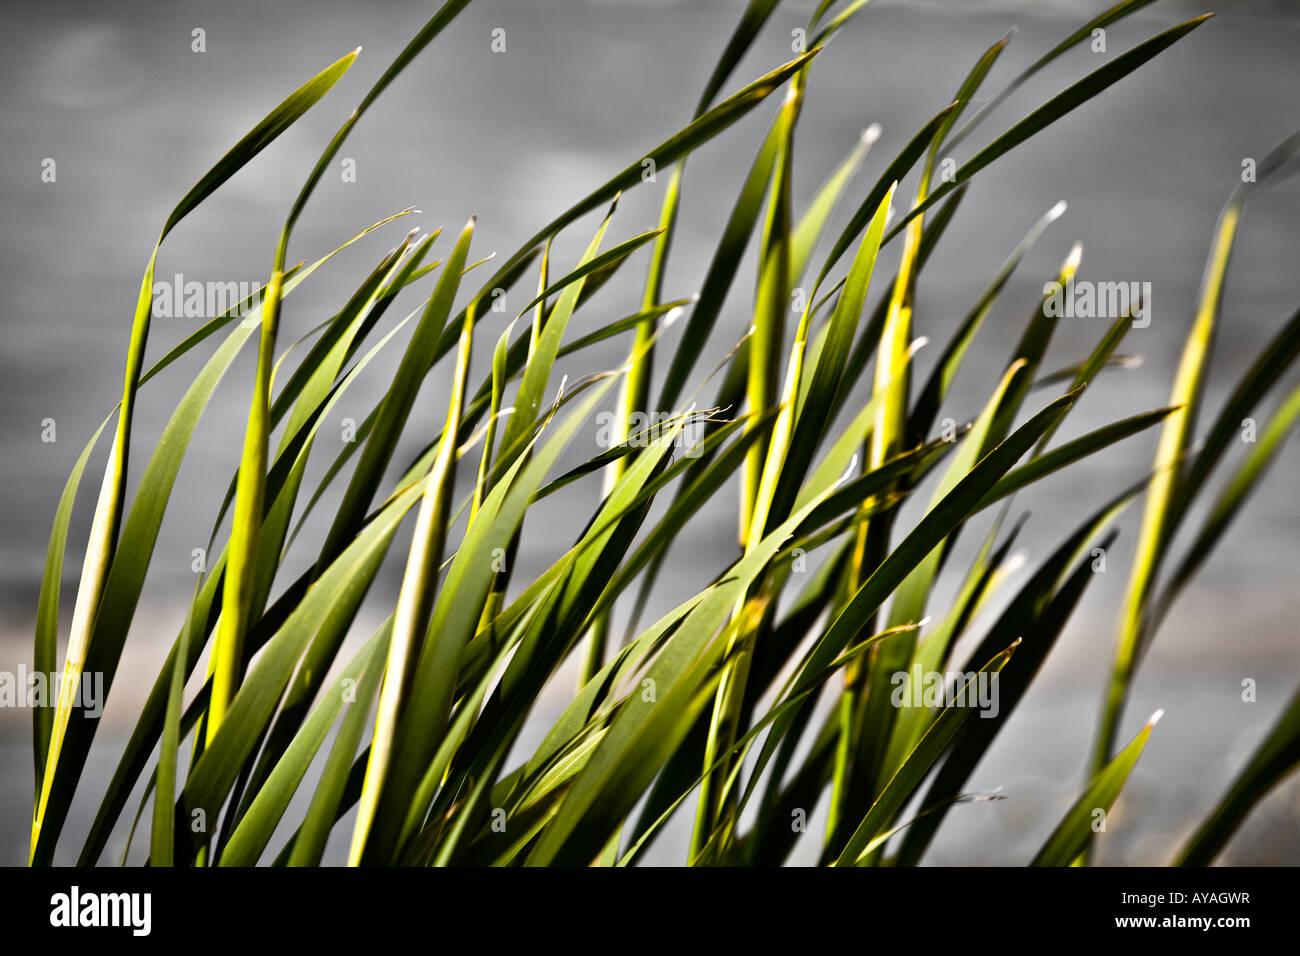 Closeup of blades of grass - Stock Image